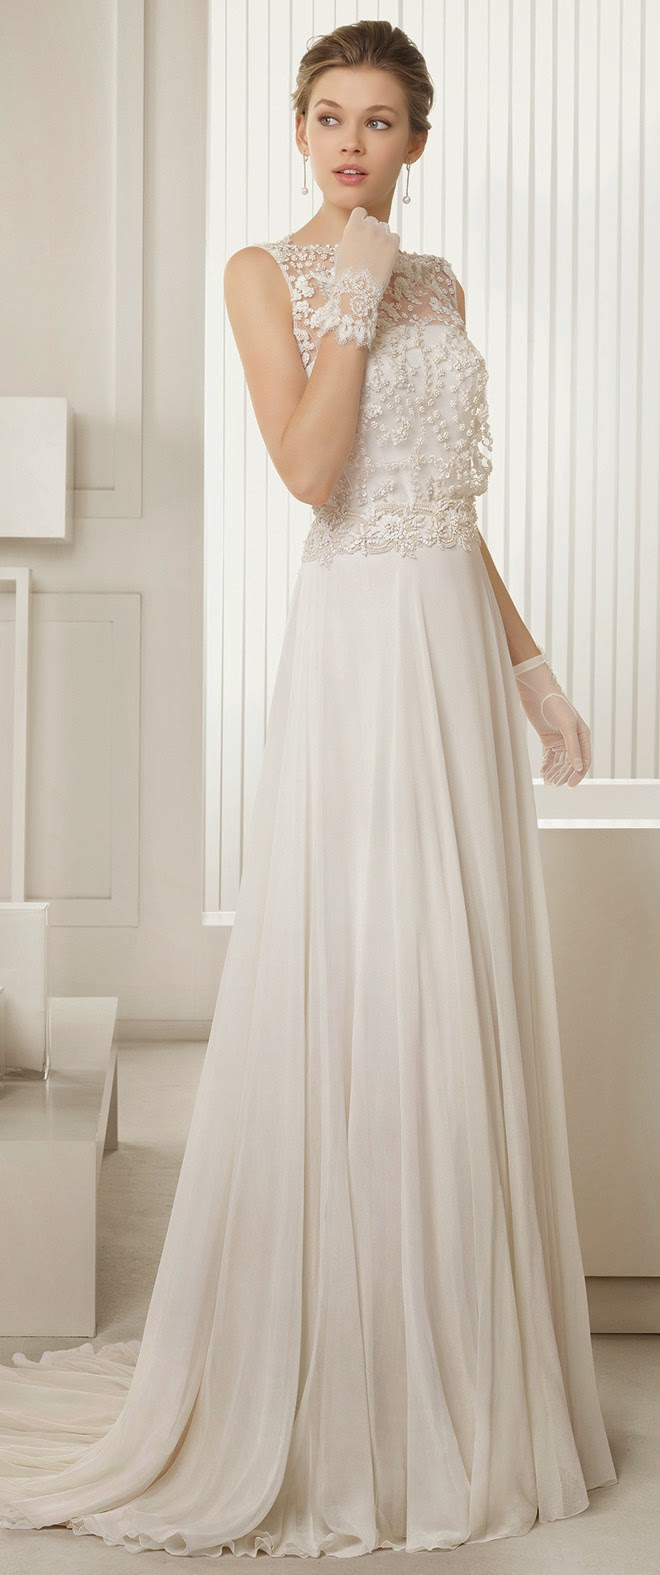 Rosa Clara Wedding Dresses 97 Inspirational Please contact Rosa Clara